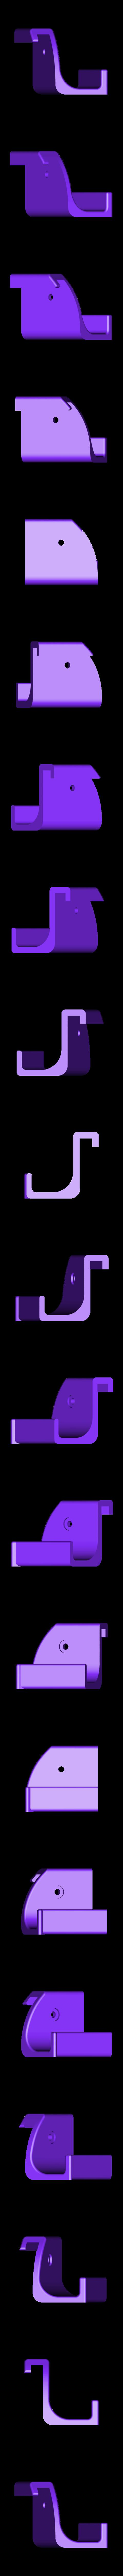 External Dock.stl Télécharger fichier STL gratuit External dock for MARK 2 Ultimaker • Design imprimable en 3D, Rigs